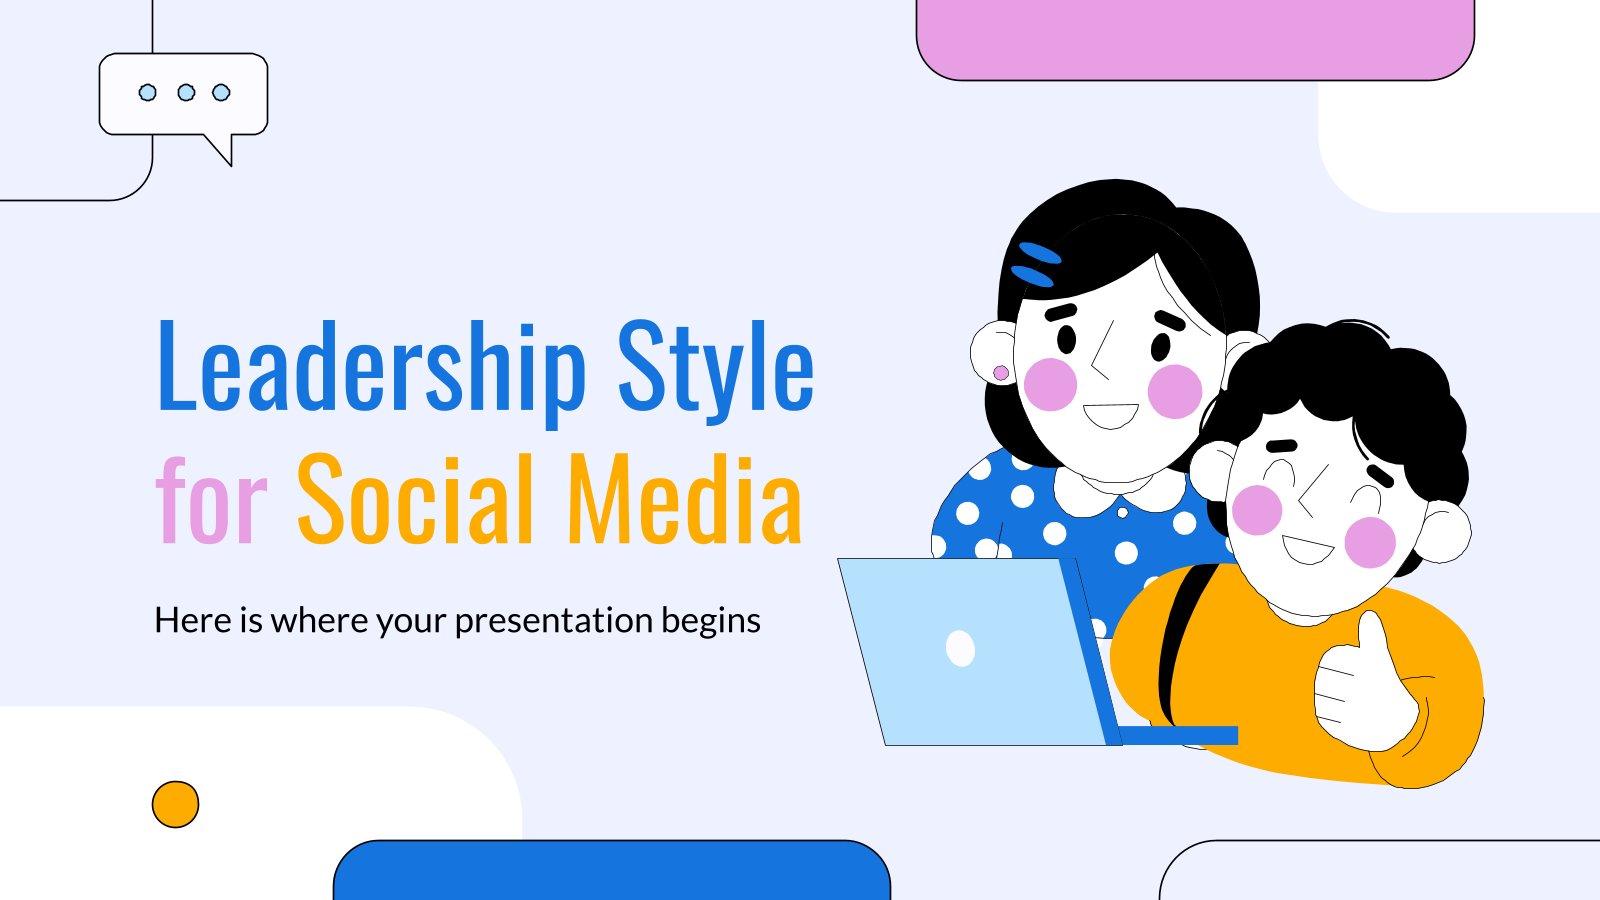 Leadership Style for Social Media presentation template